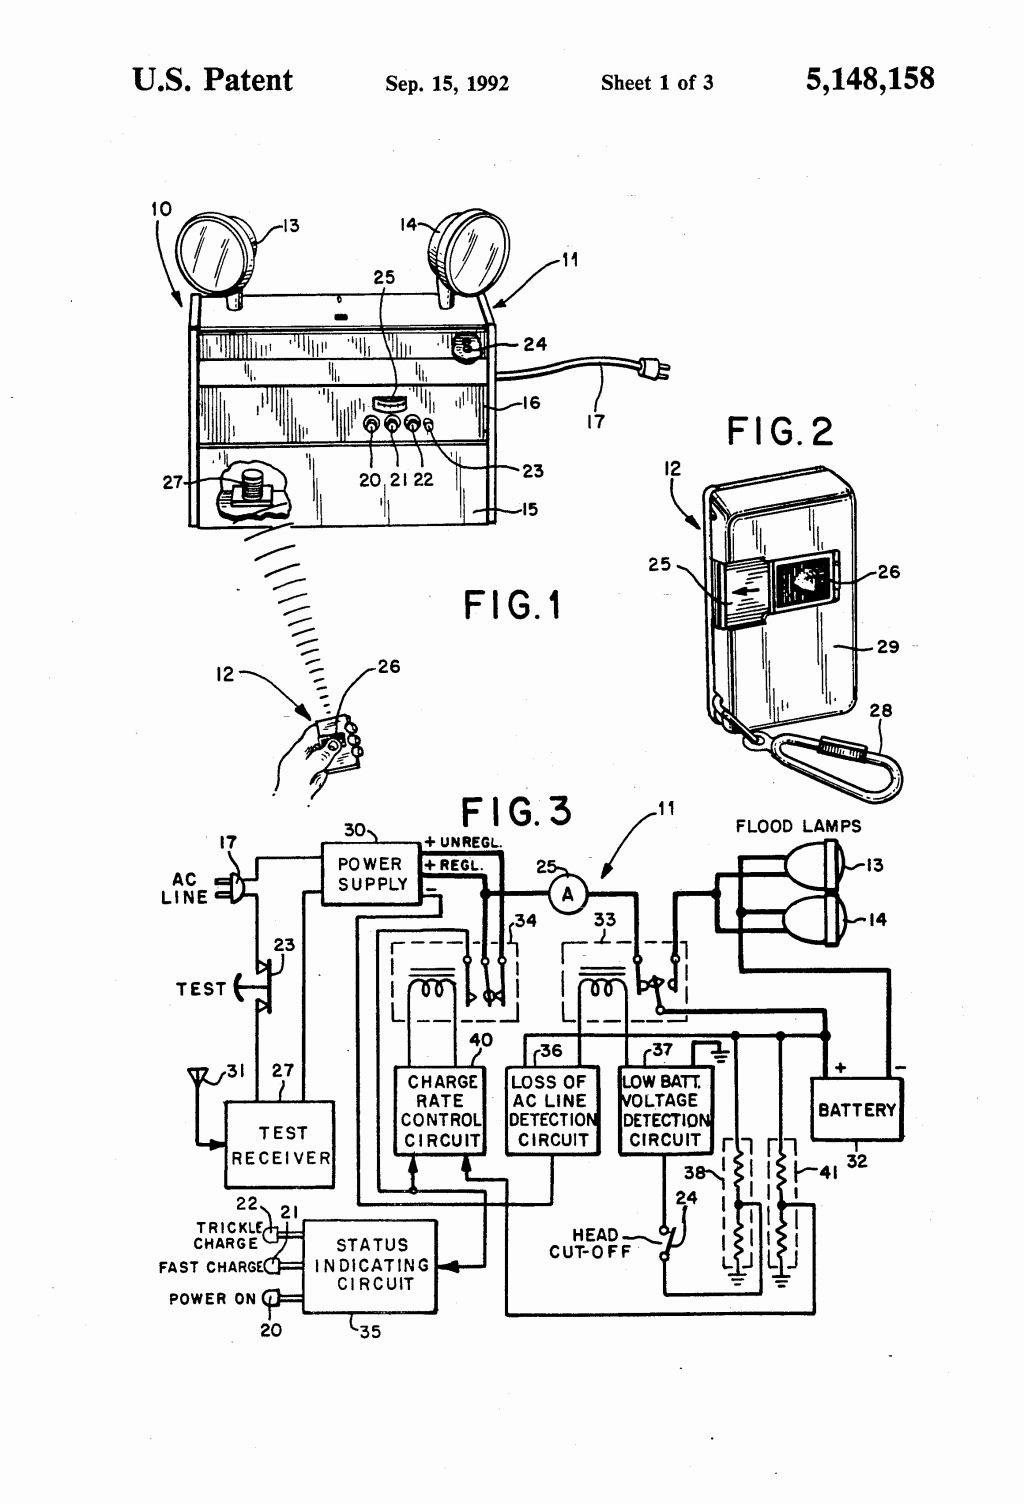 iota i 24 emergency ballast wiring diagram kenwood ddx6019 color advance instant start t9 download philips best